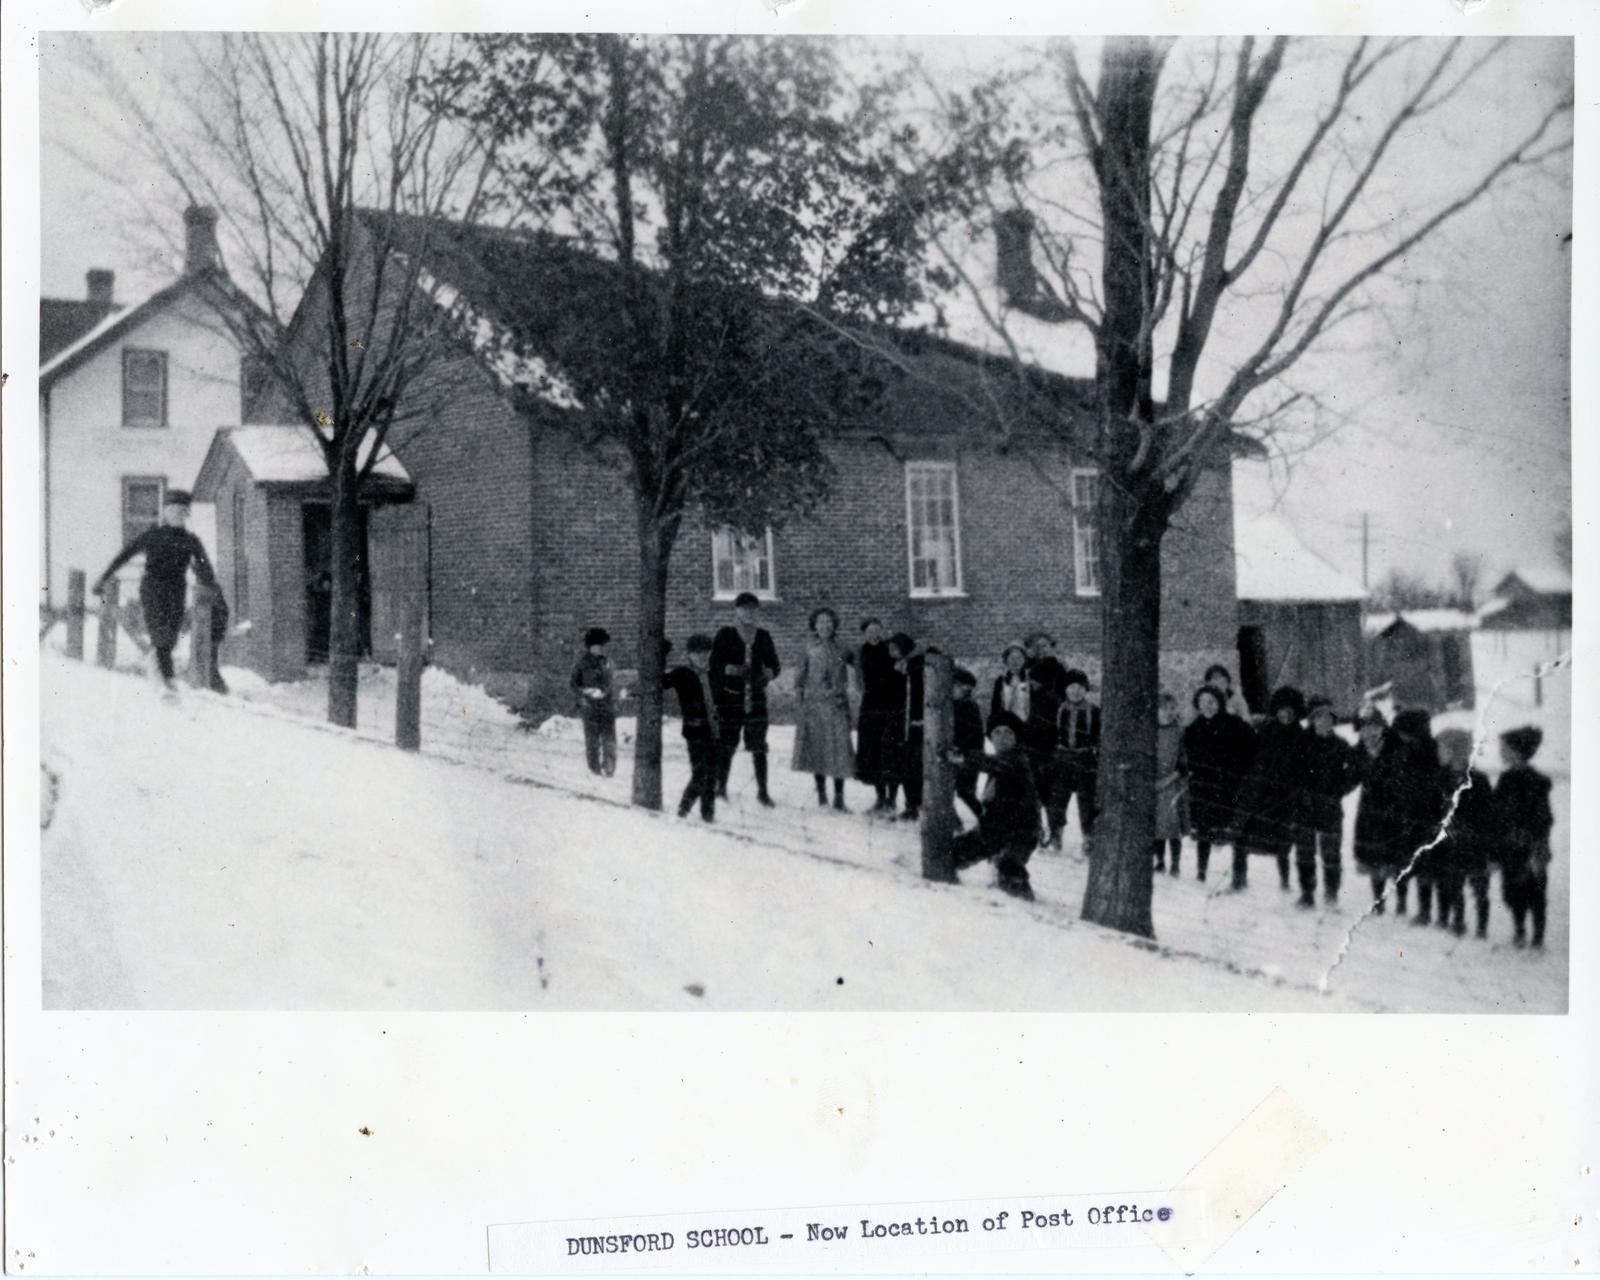 page 65 - Dunsford School